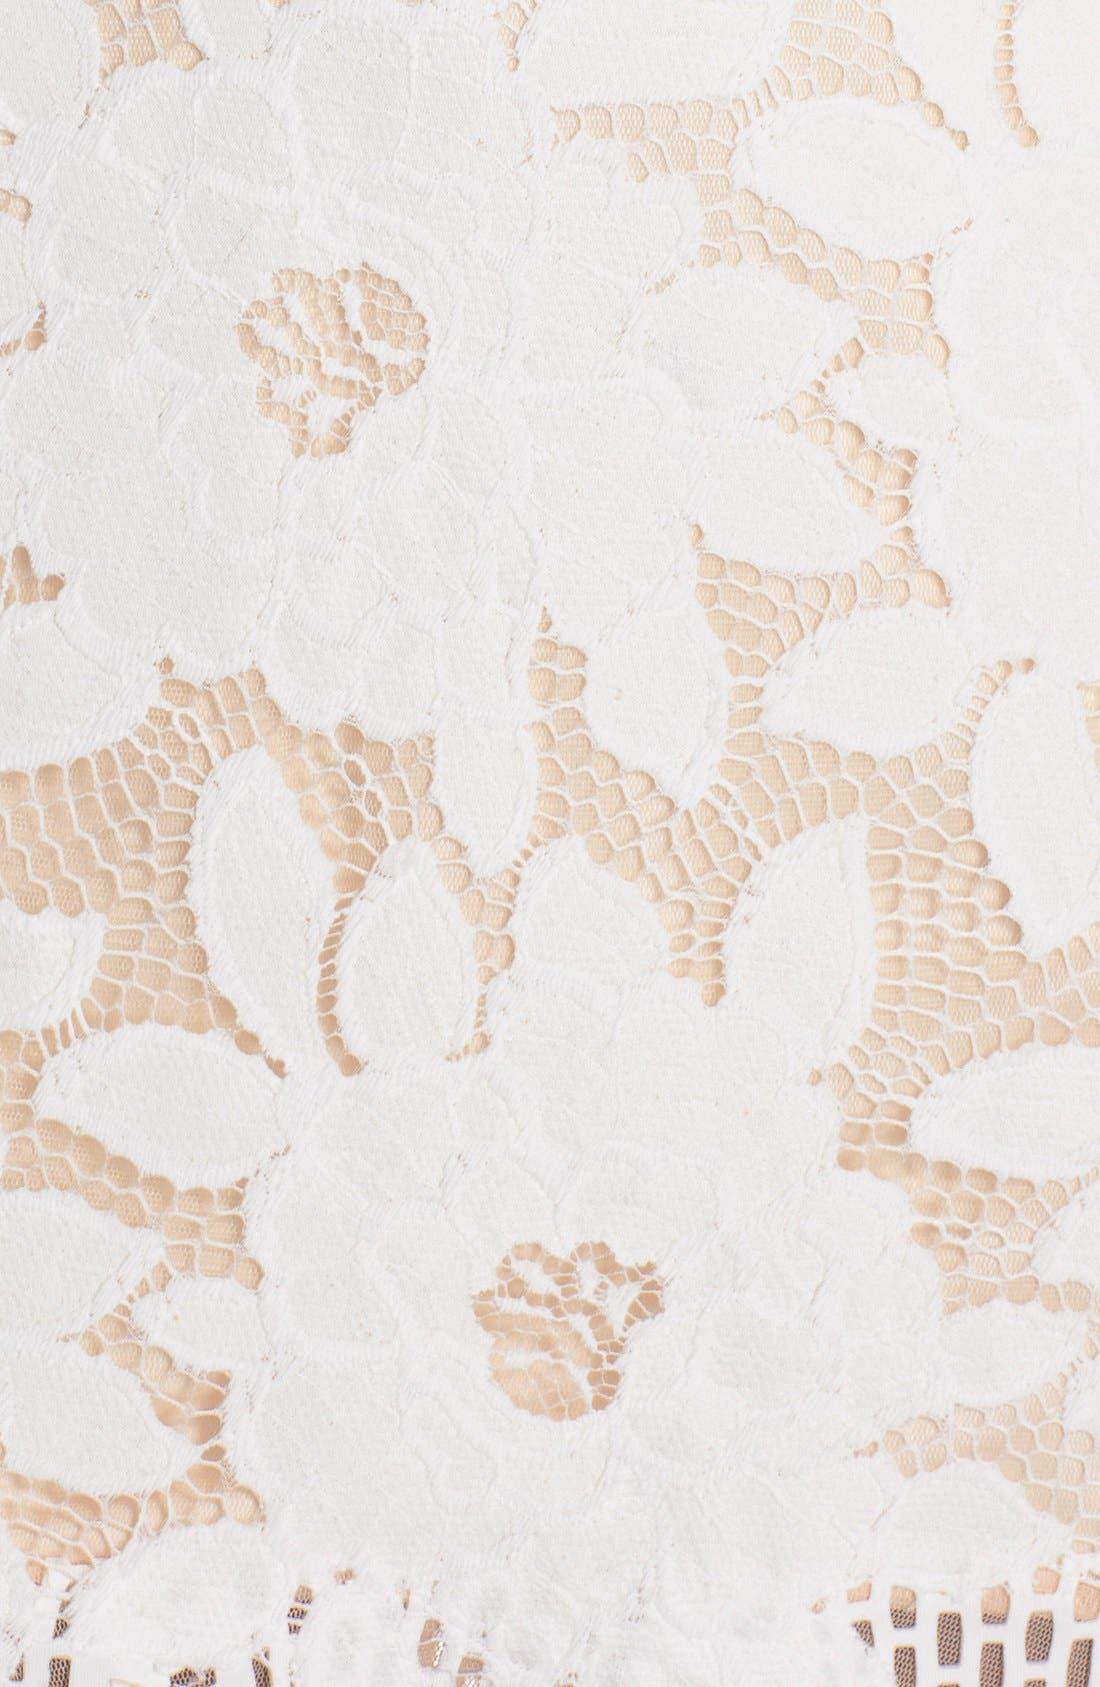 Lace & Cutout Neoprene Sheath Dress,                             Alternate thumbnail 6, color,                             904